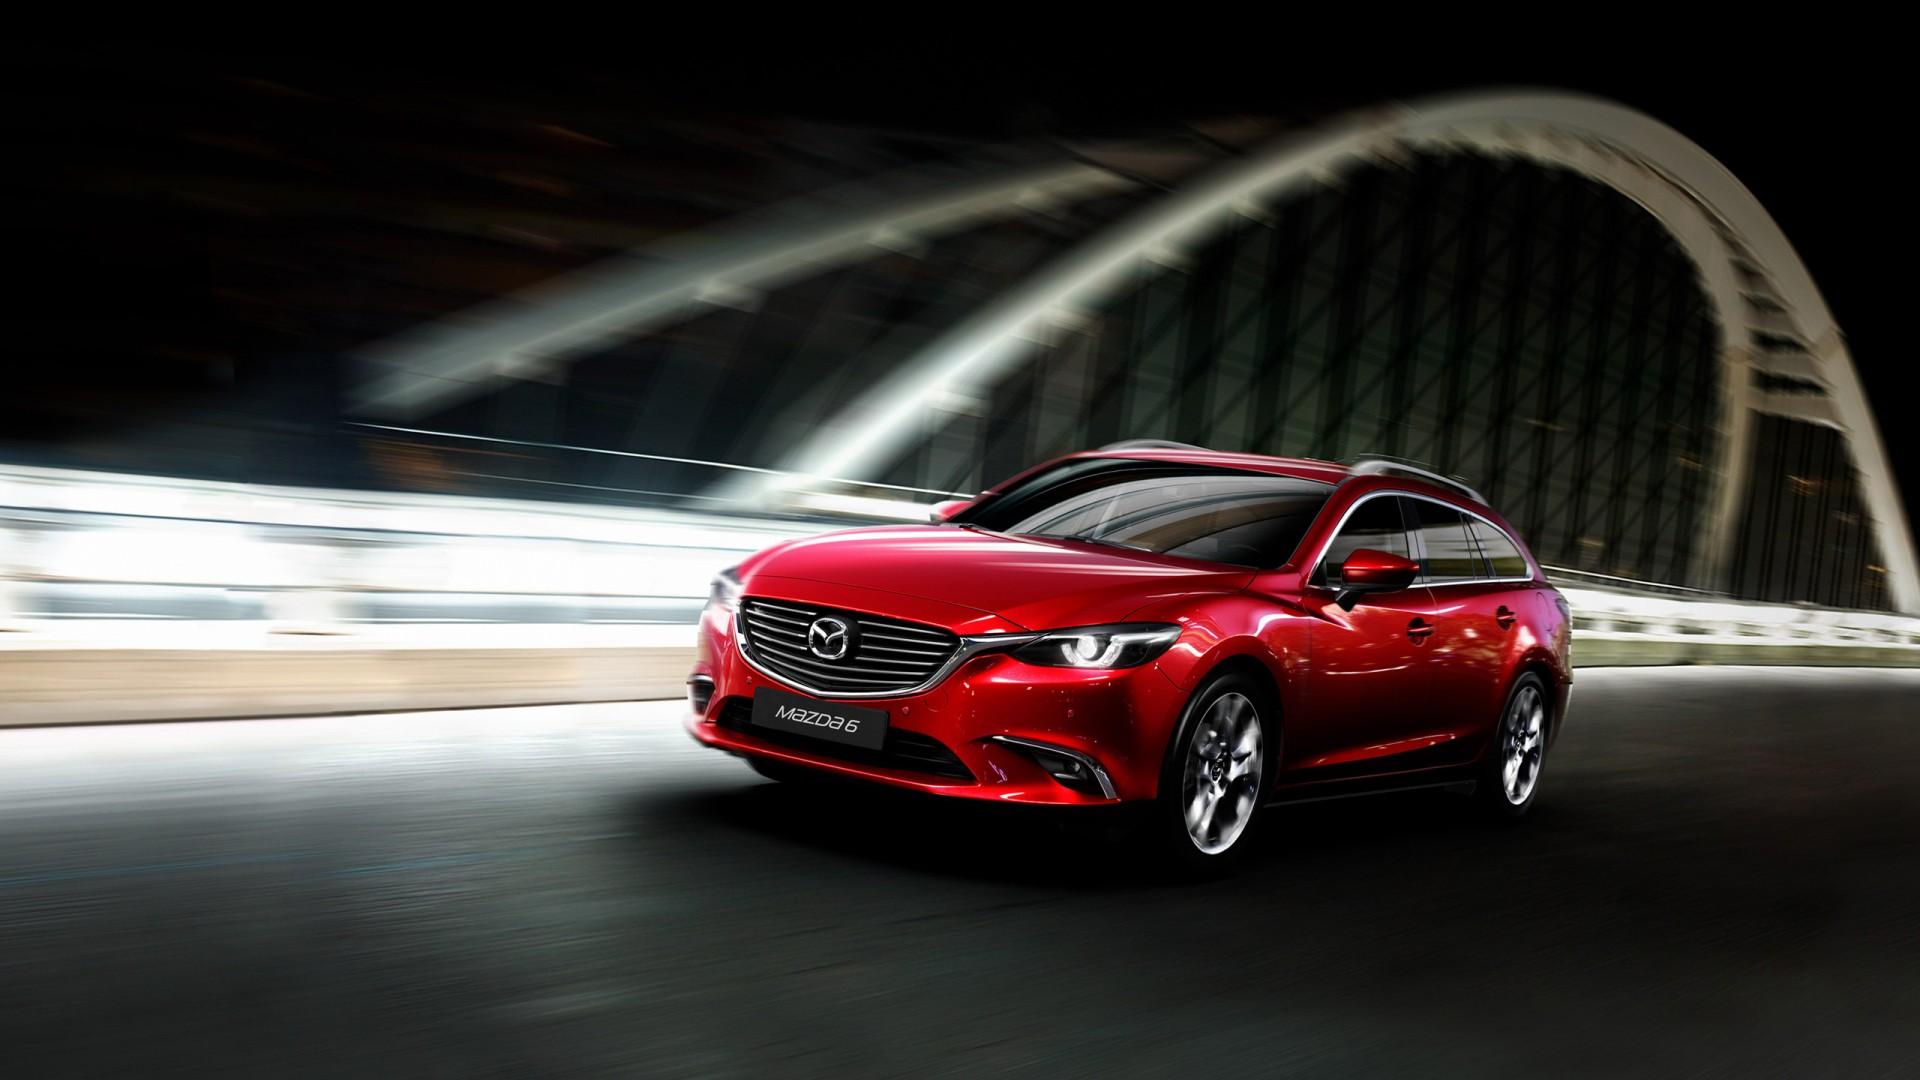 2015 Mazda 6 Wallpaper Hd Car Wallpapers Id 4967